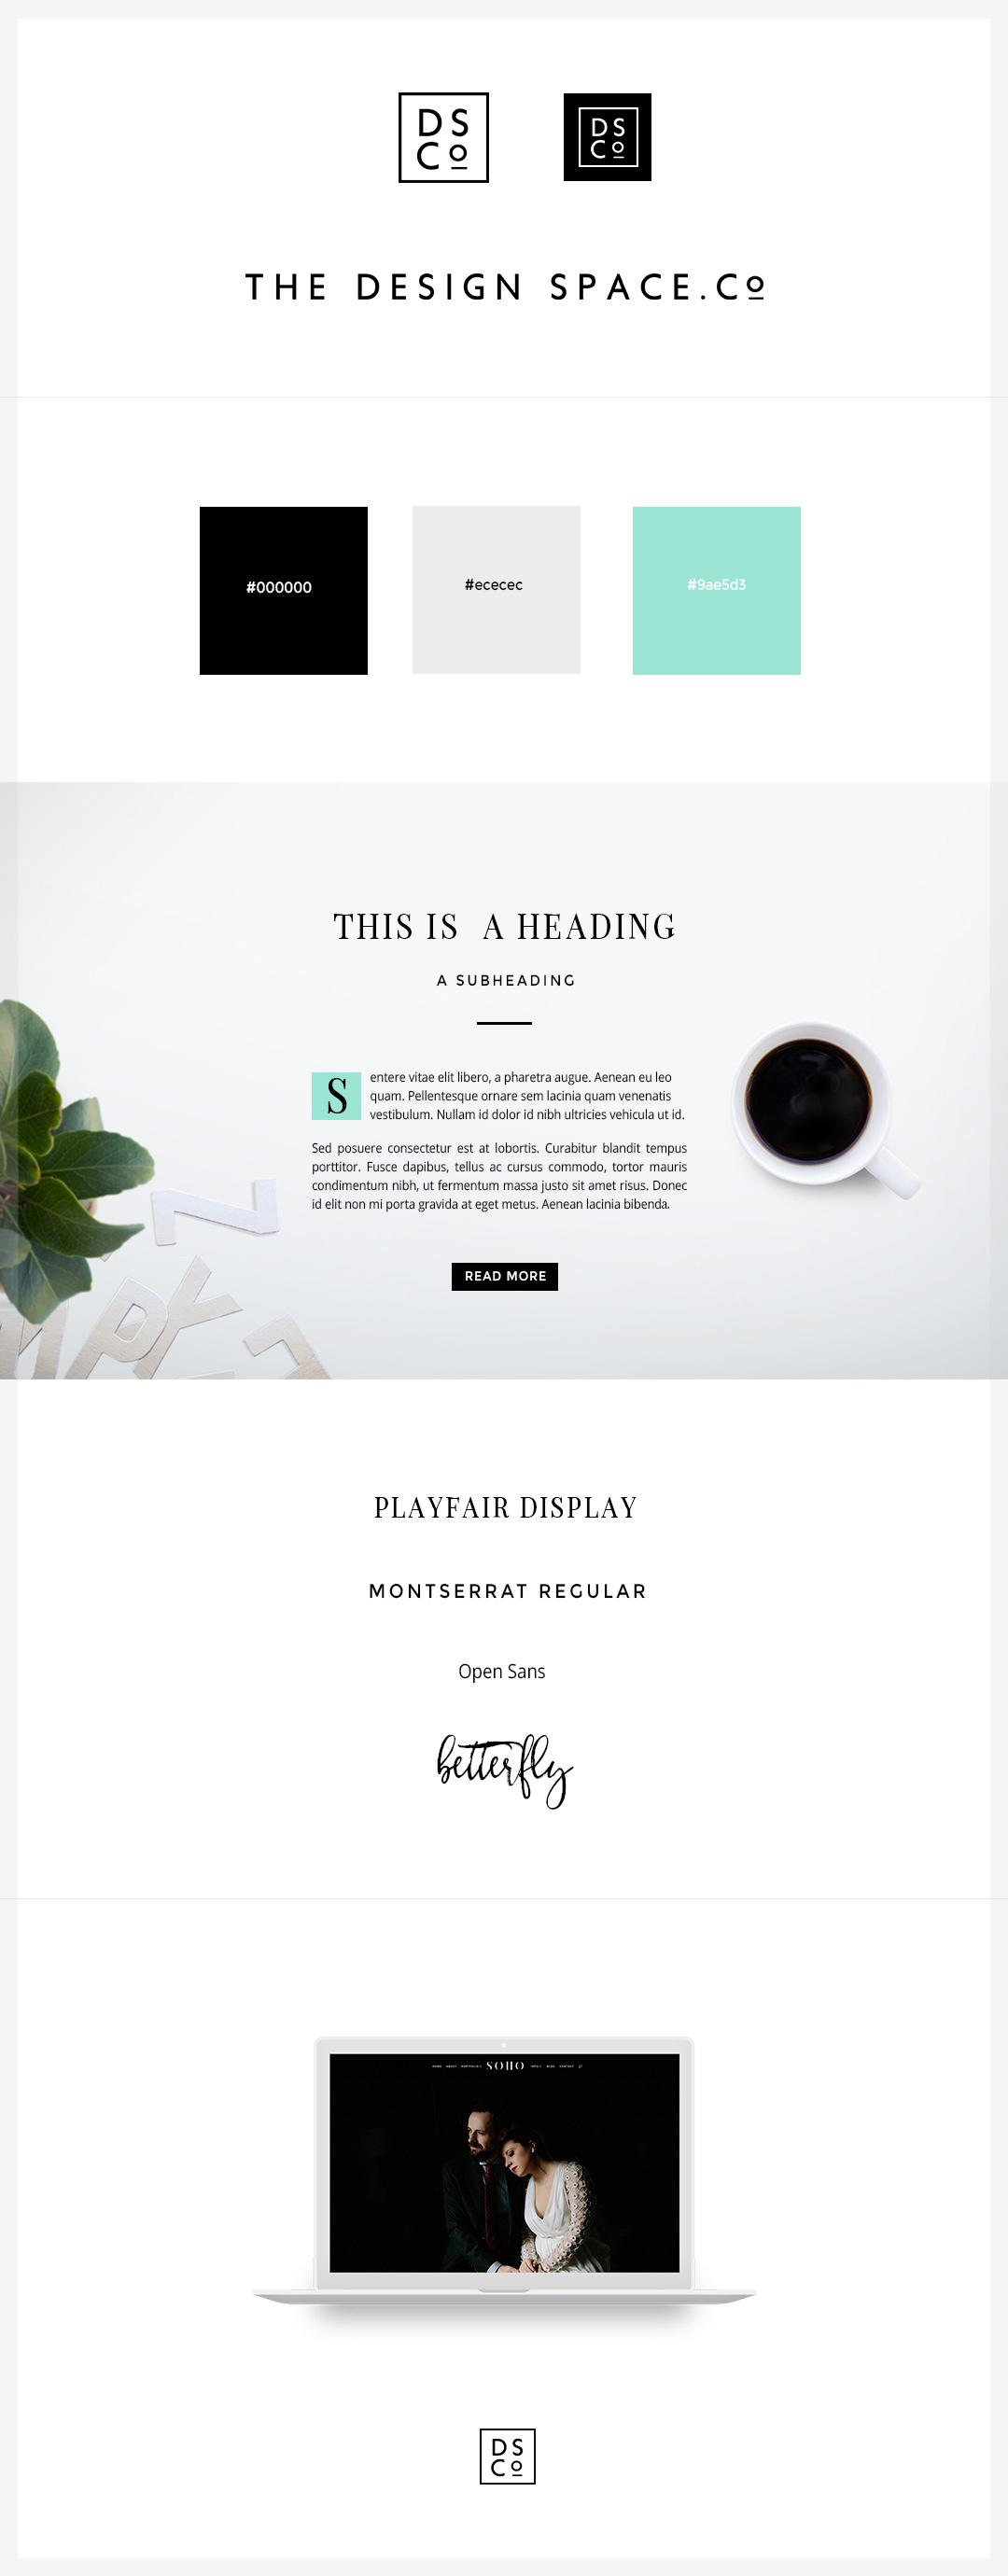 the-design-space-brand-guide